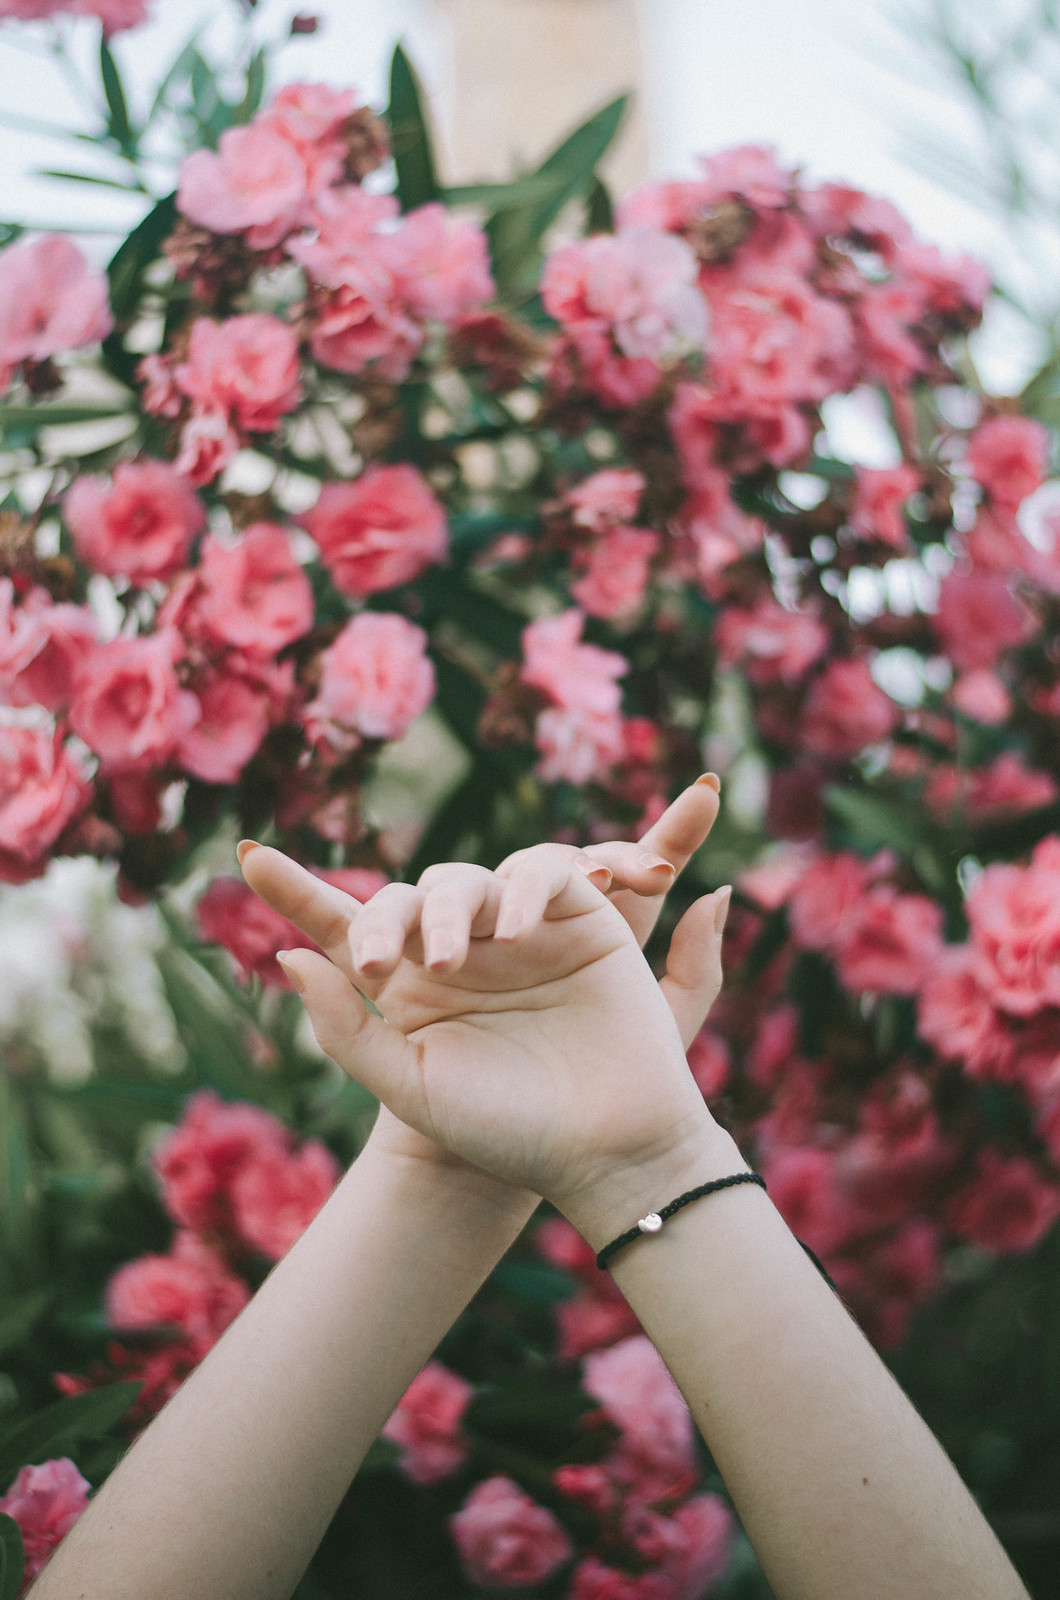 rose hands